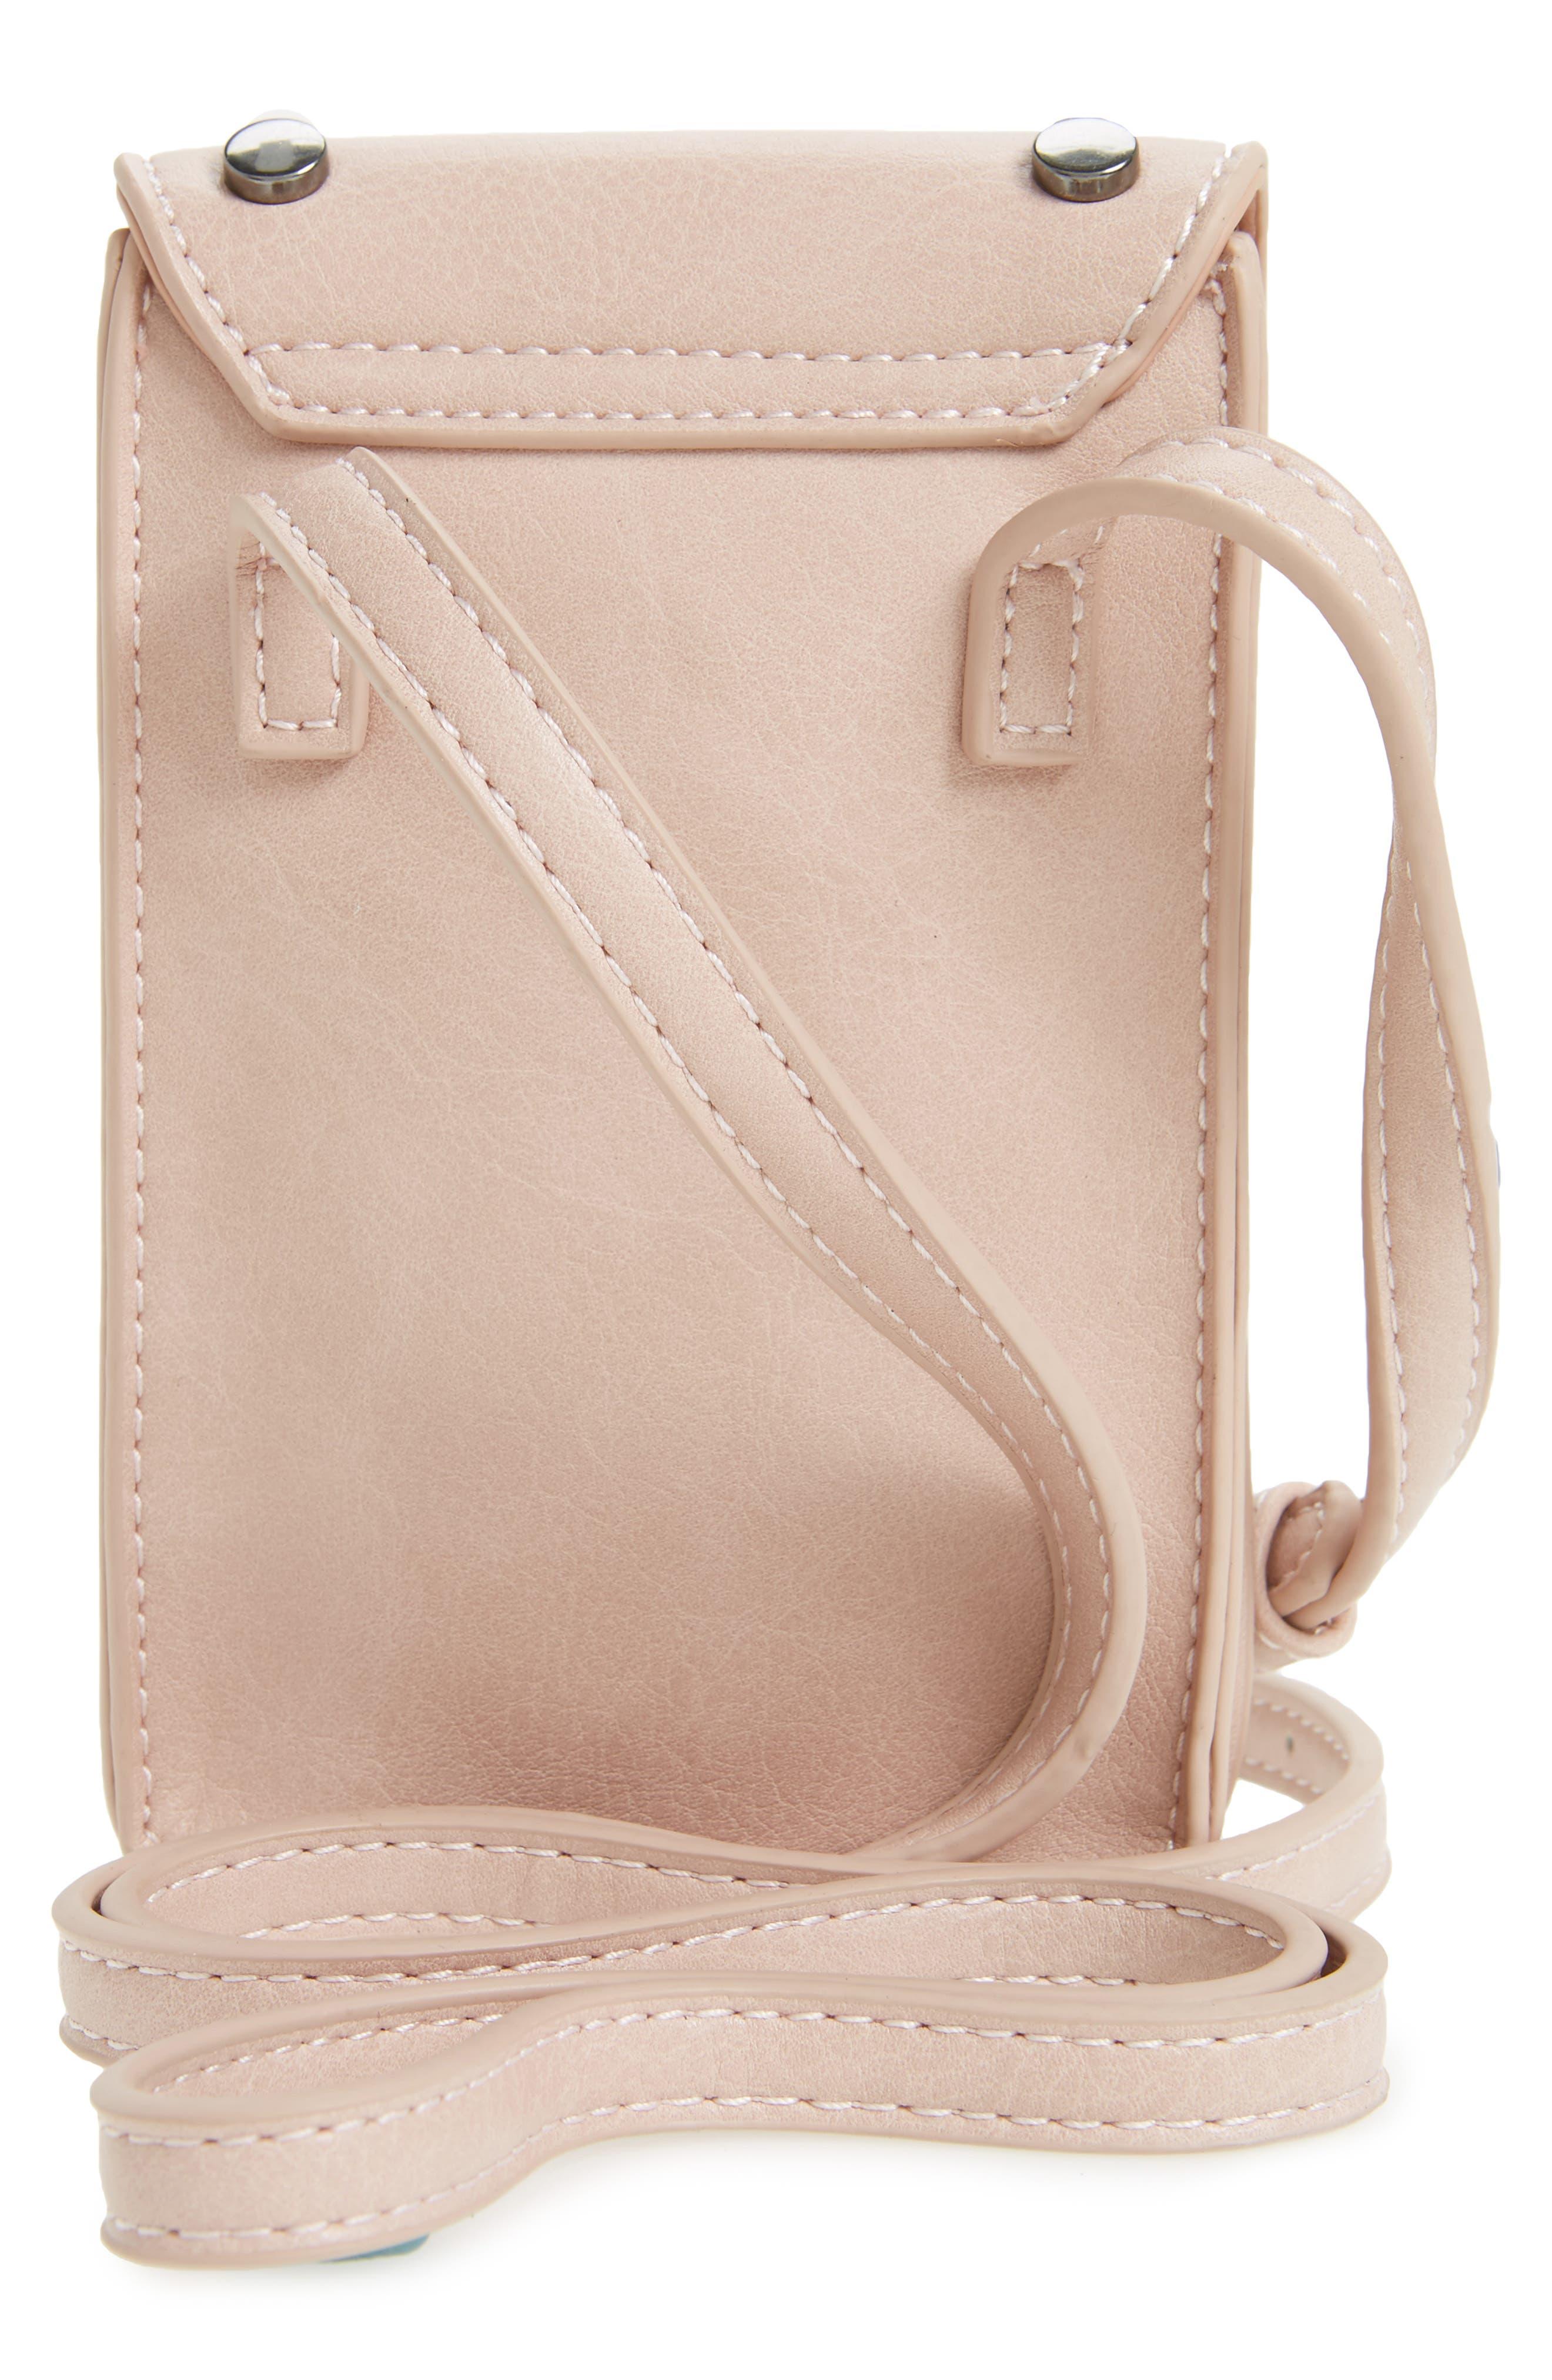 Studded Phone Crossbody Bag,                             Alternate thumbnail 2, color,                             Blush/ Hematite